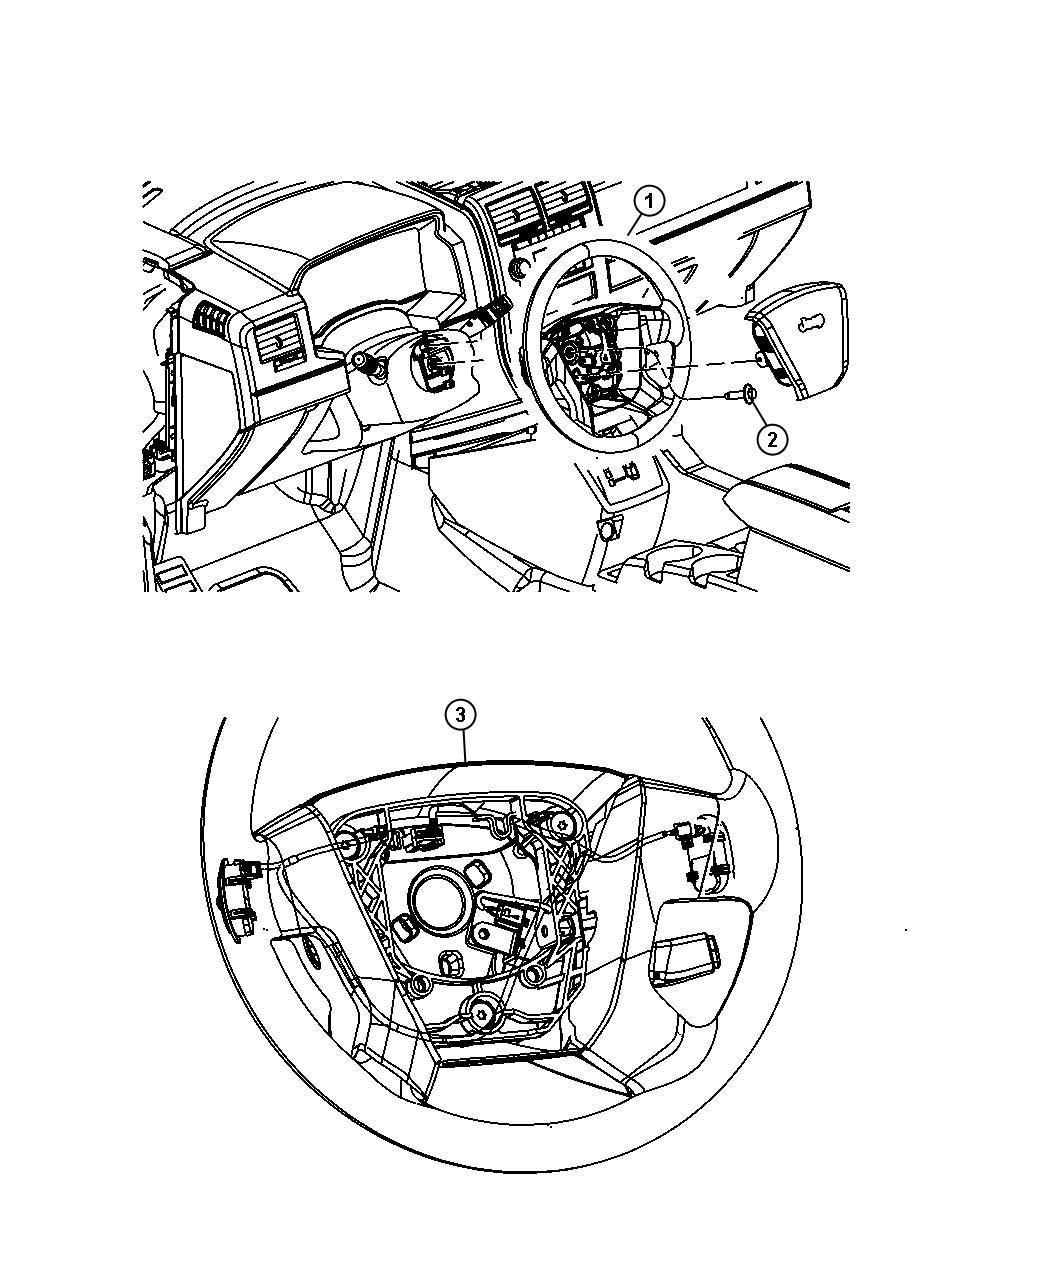 Chrysler Pt Cruiser Wheel Steering Trim All Trim Codes Color Pastel Pebble Beige